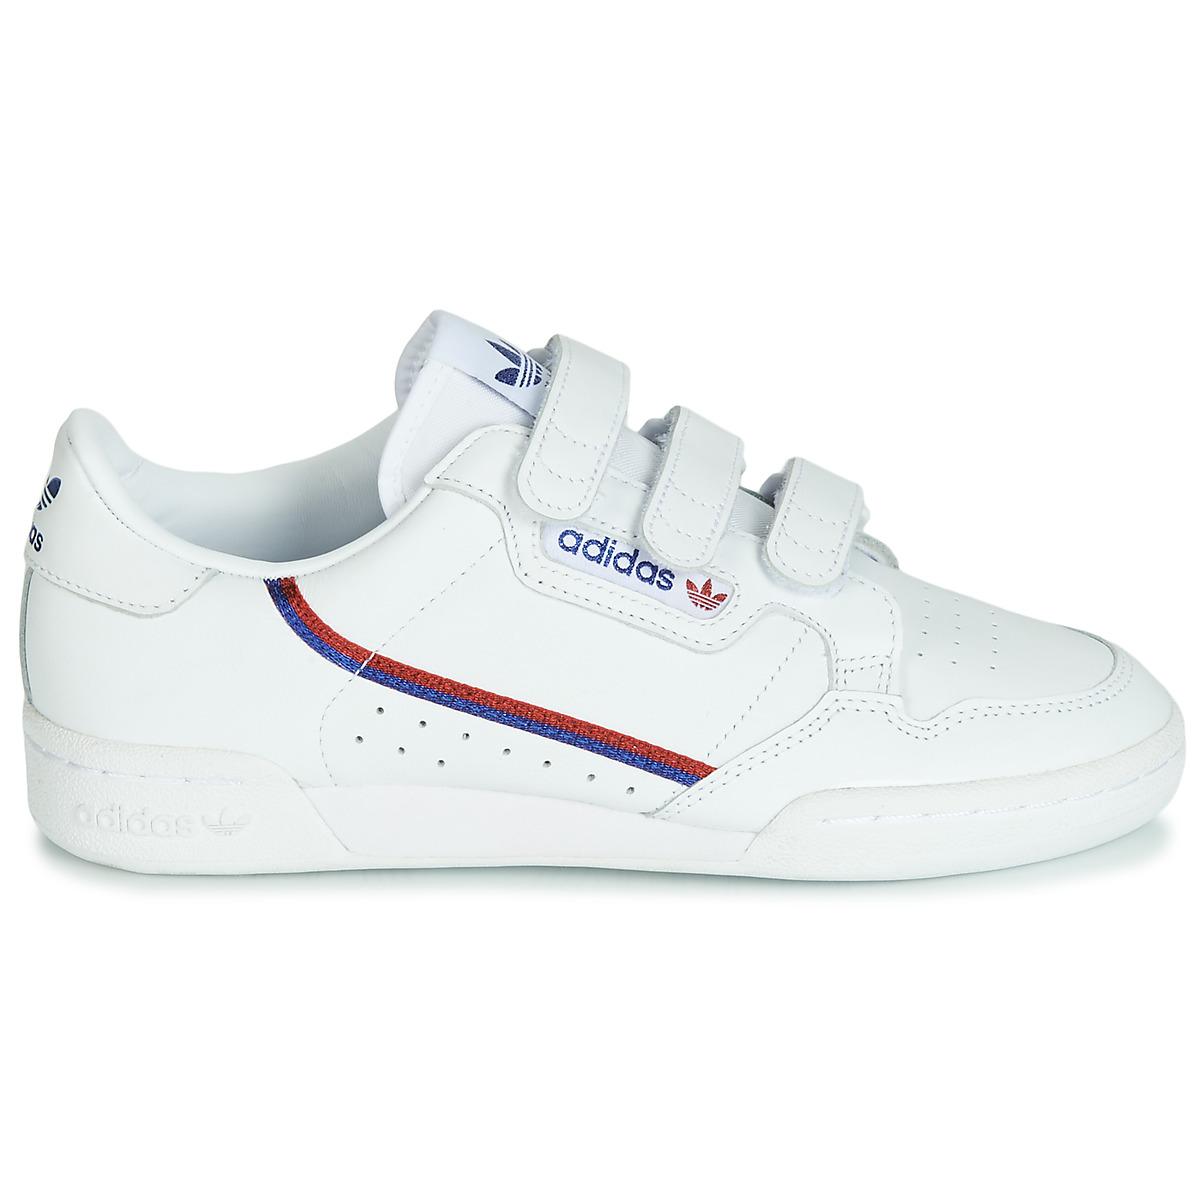 adidas scarpe donna continental 80